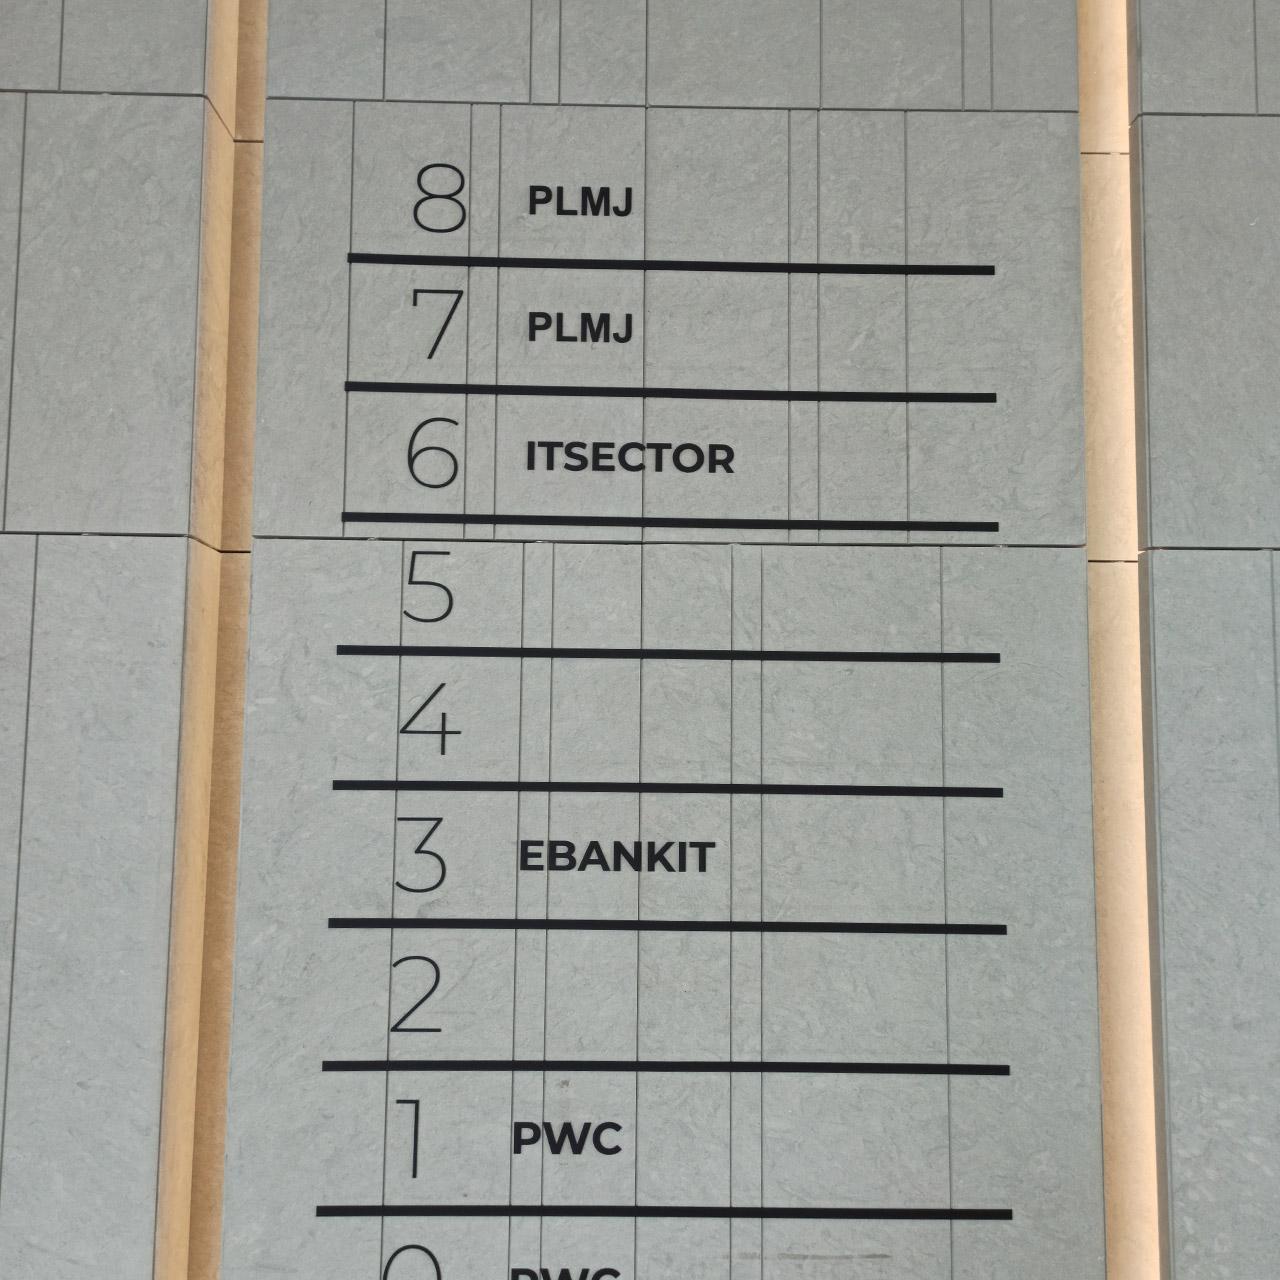 Identification Signs